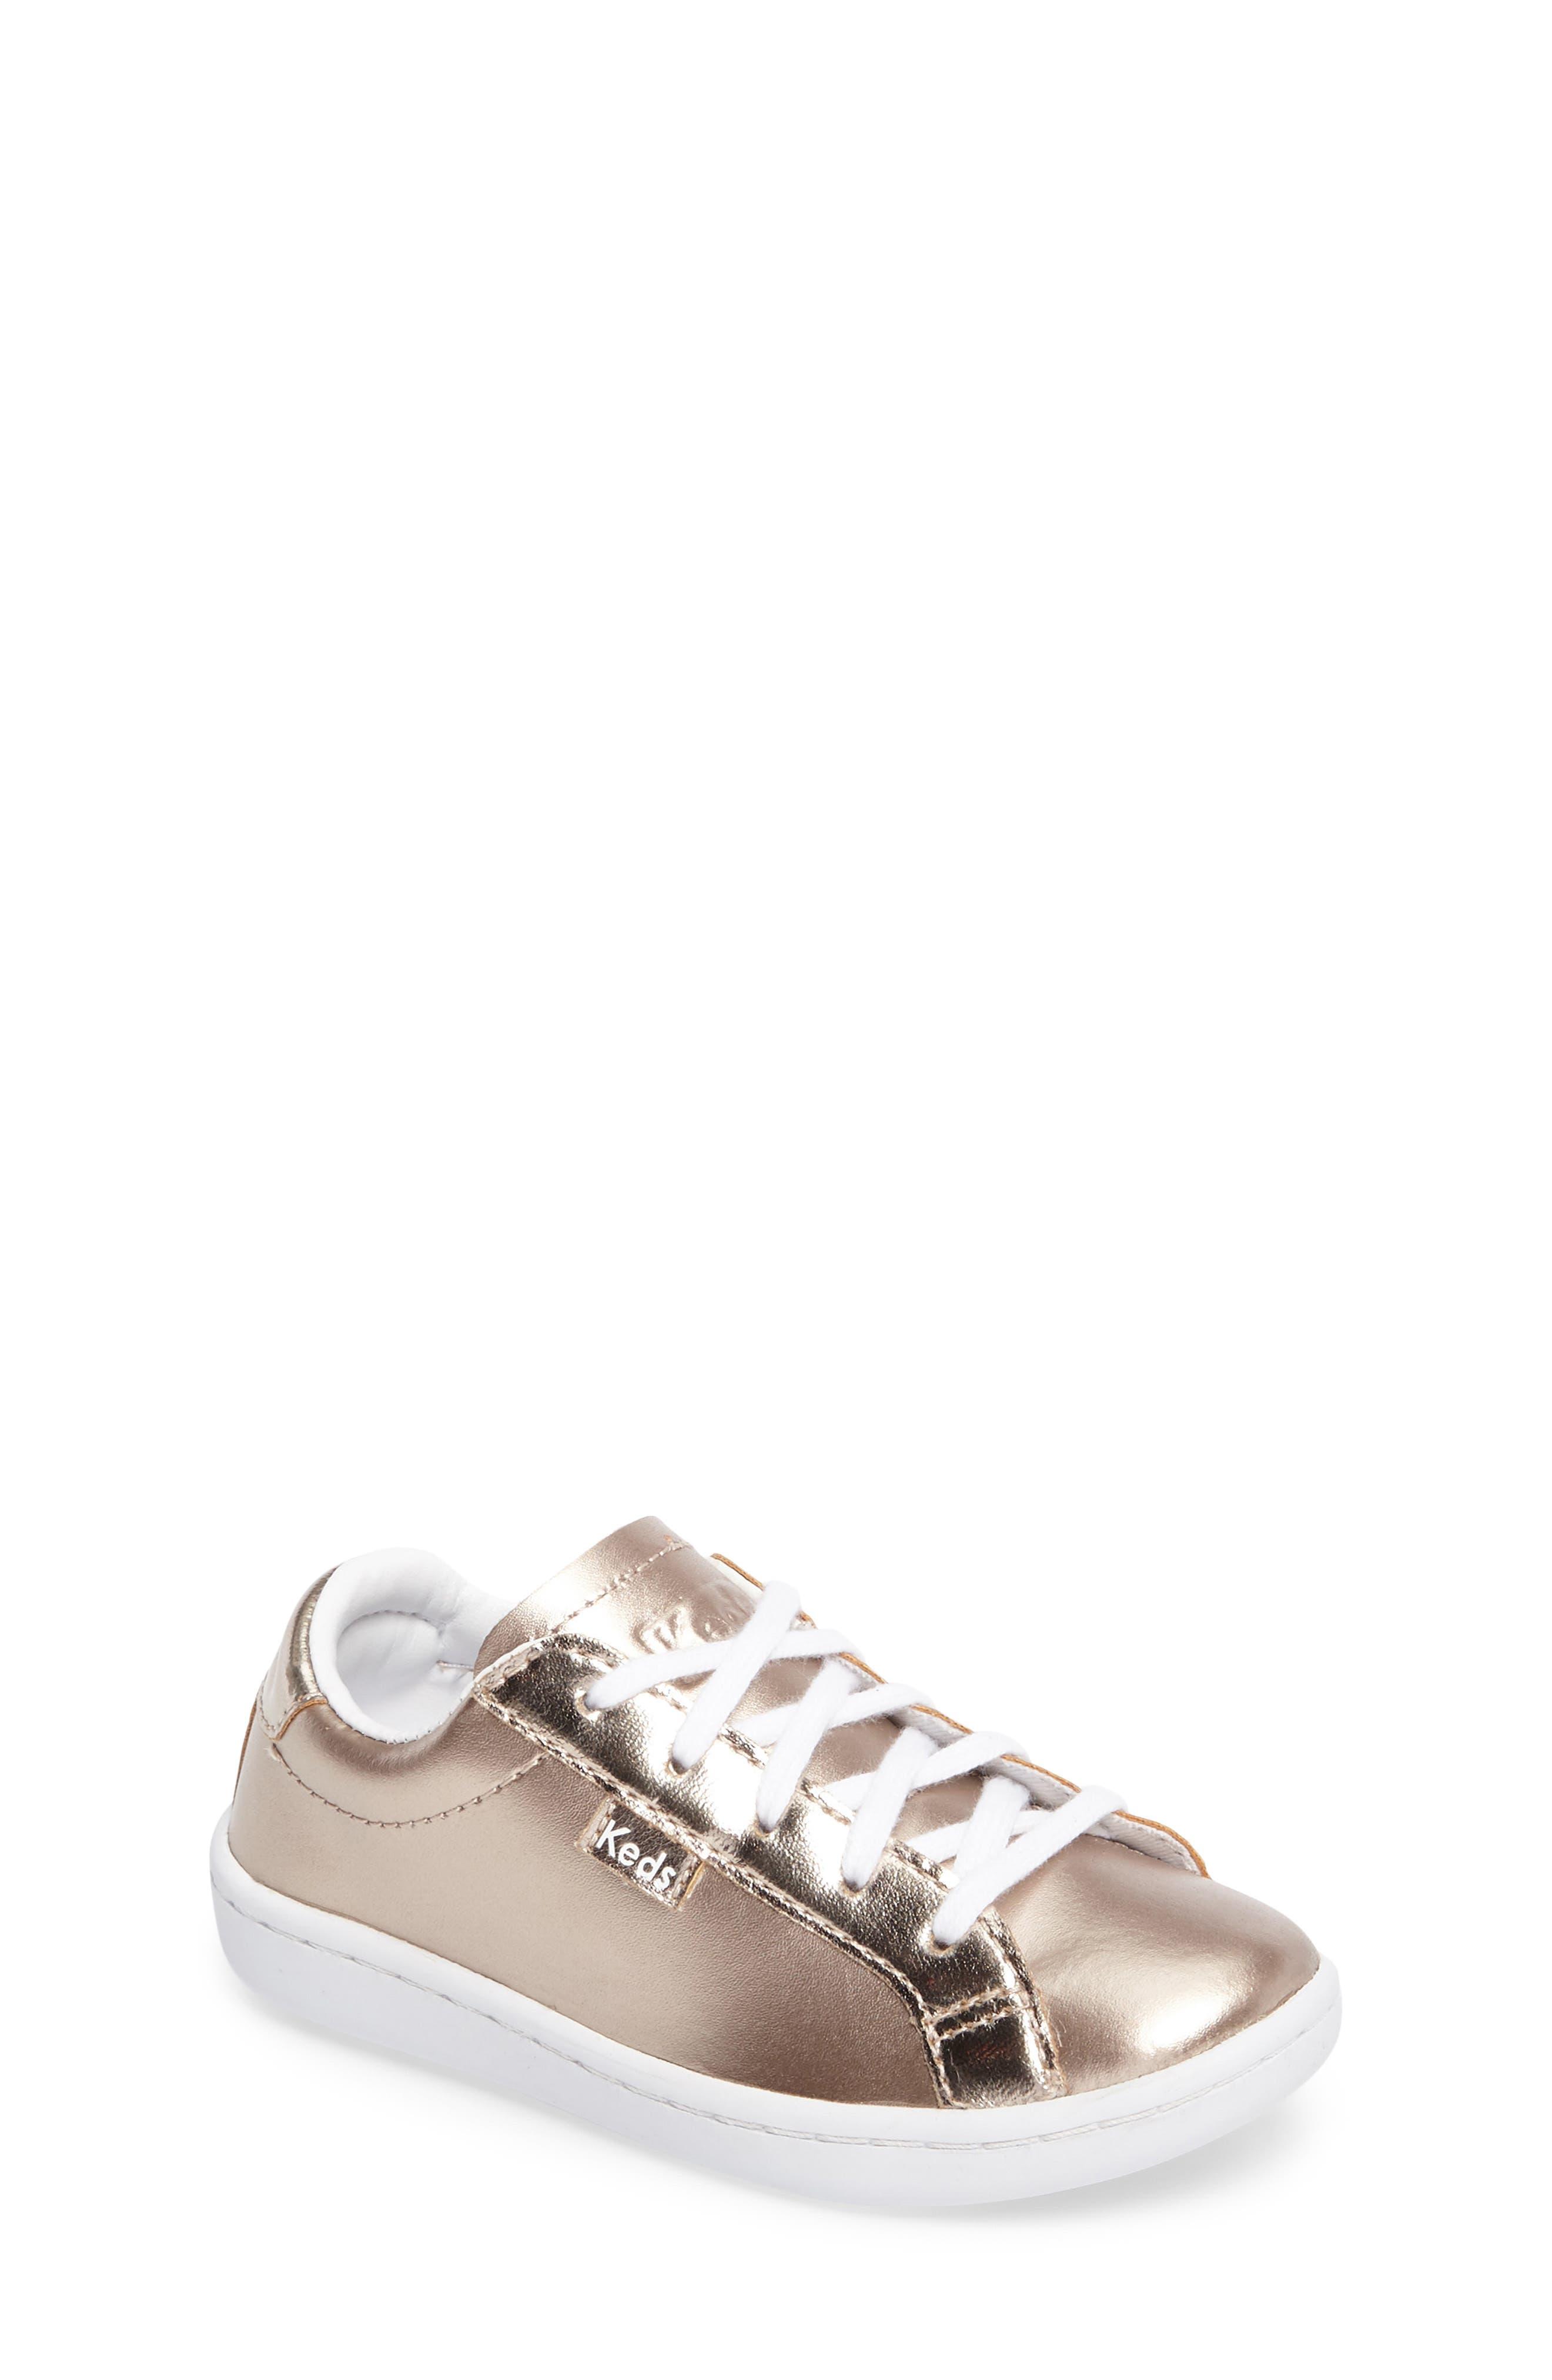 Ace Sneaker,                         Main,                         color, 220